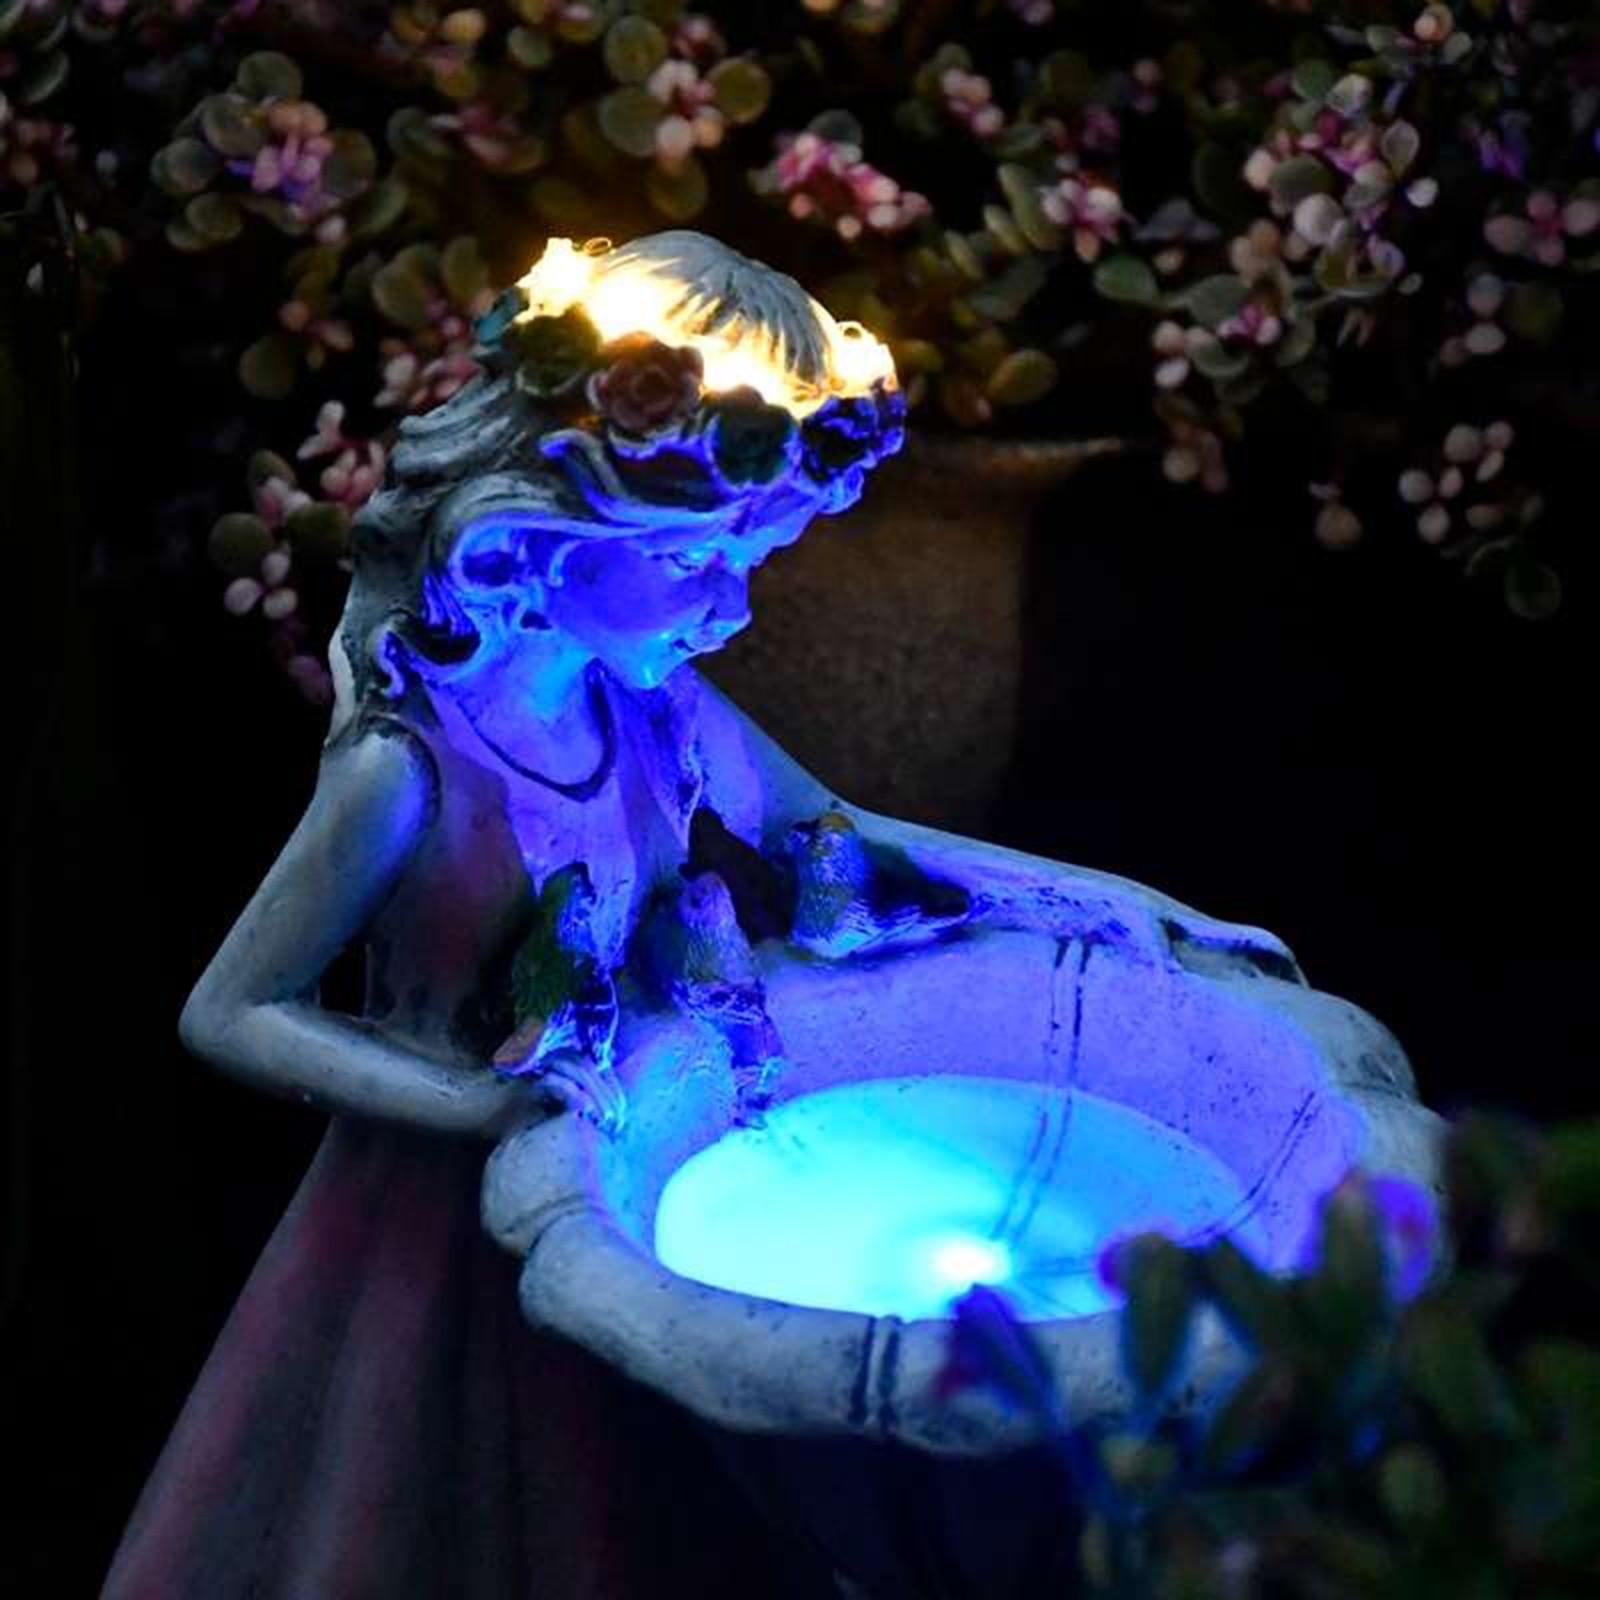 Flower Fairy Solar Decoration Resin Garden Statue Solar Light Glow in the Dark Yard Outdoor Sculpture Angel Figure Garden Decor